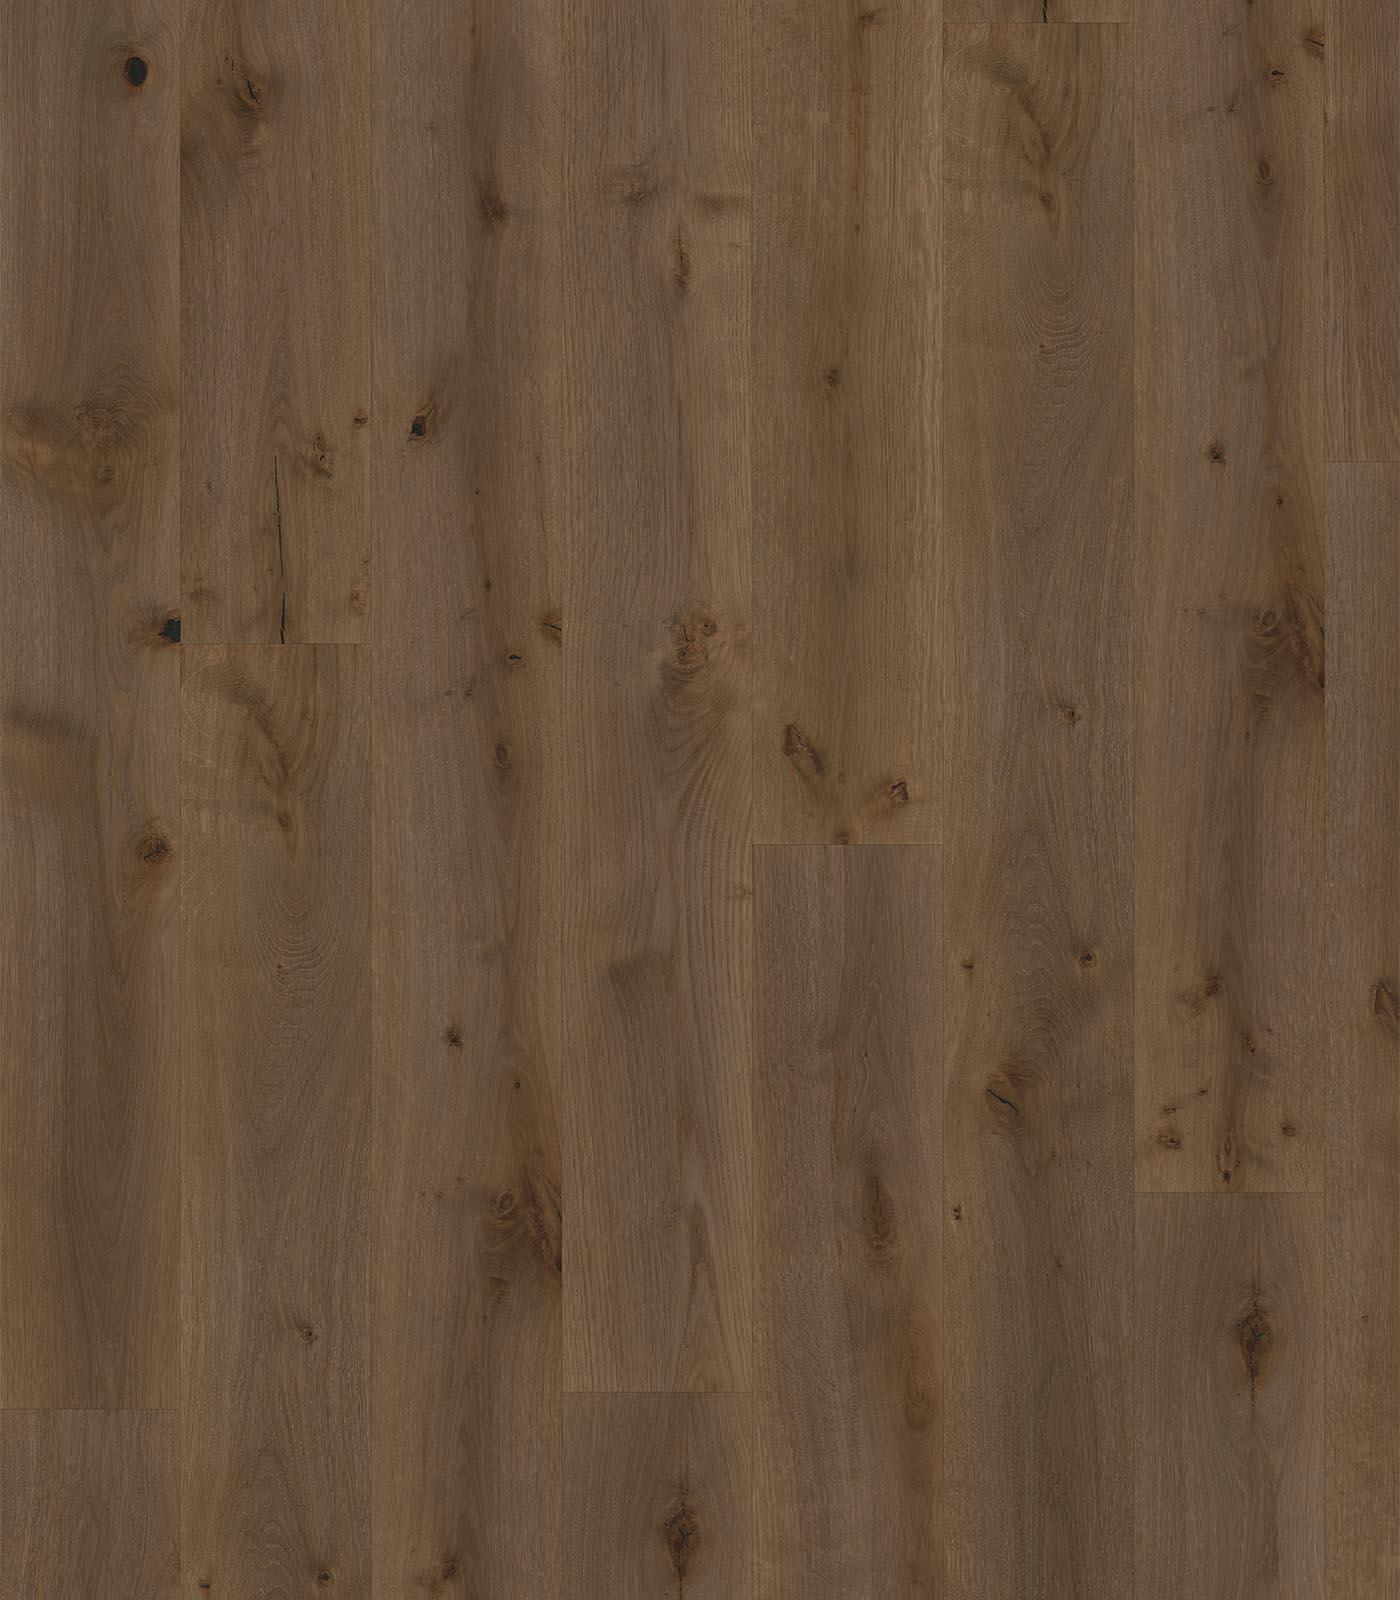 Cuba-European Oak Floors-Island Collection-flat